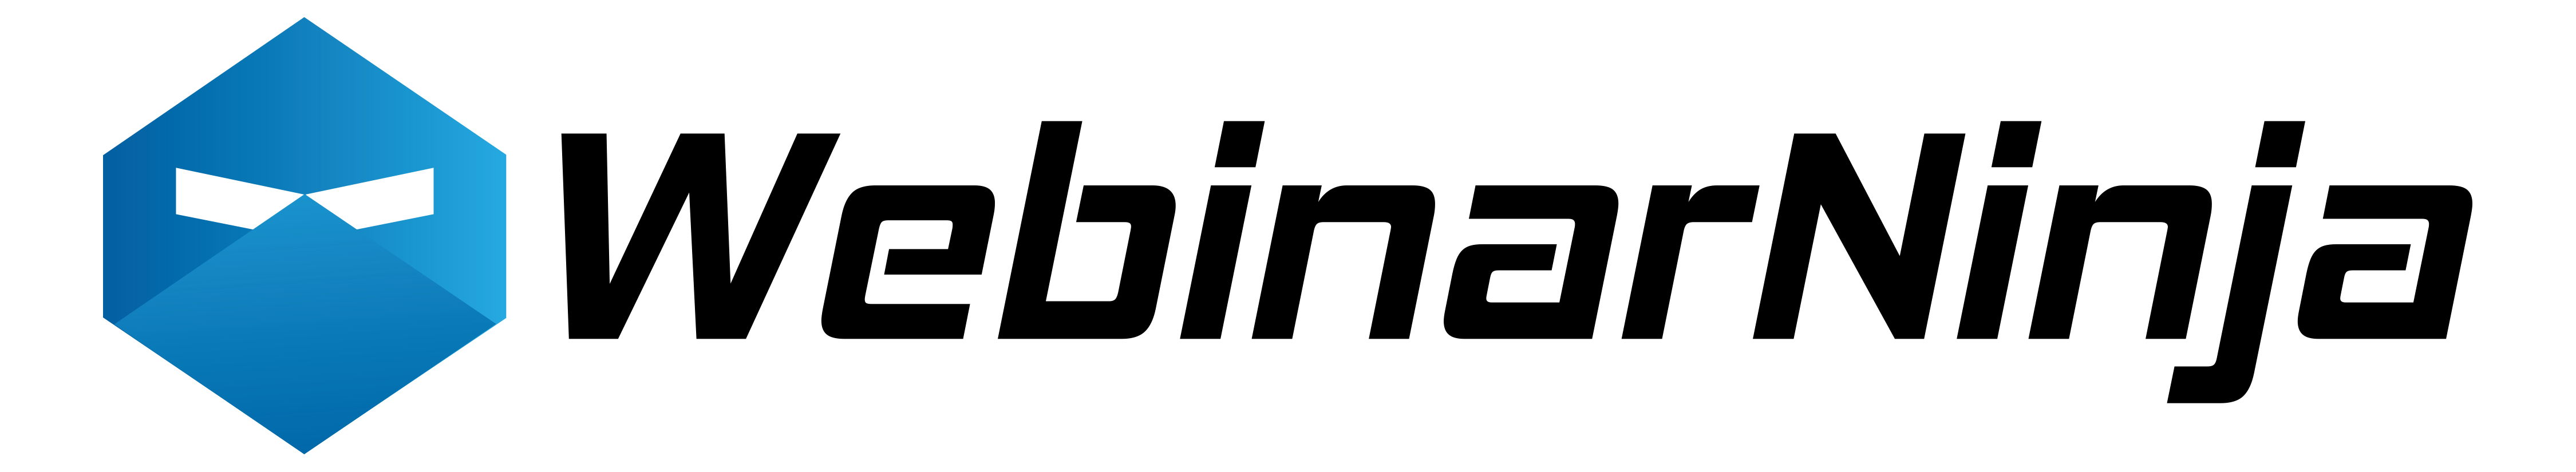 WebinarNinja Webinar Software